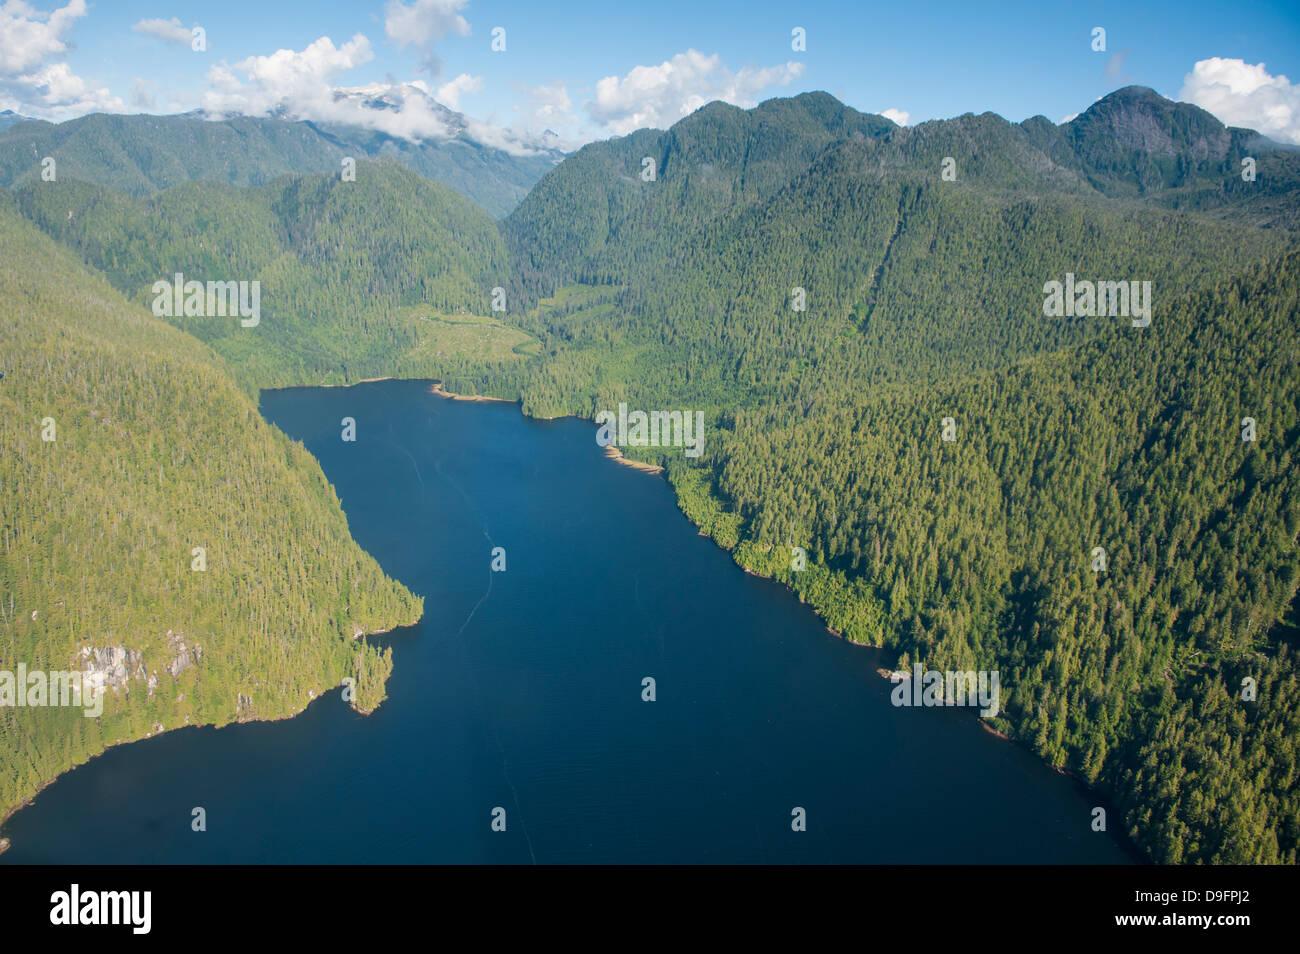 Coastal scenery in Great Bear Rainforest, British Columbia, Canada - Stock Image